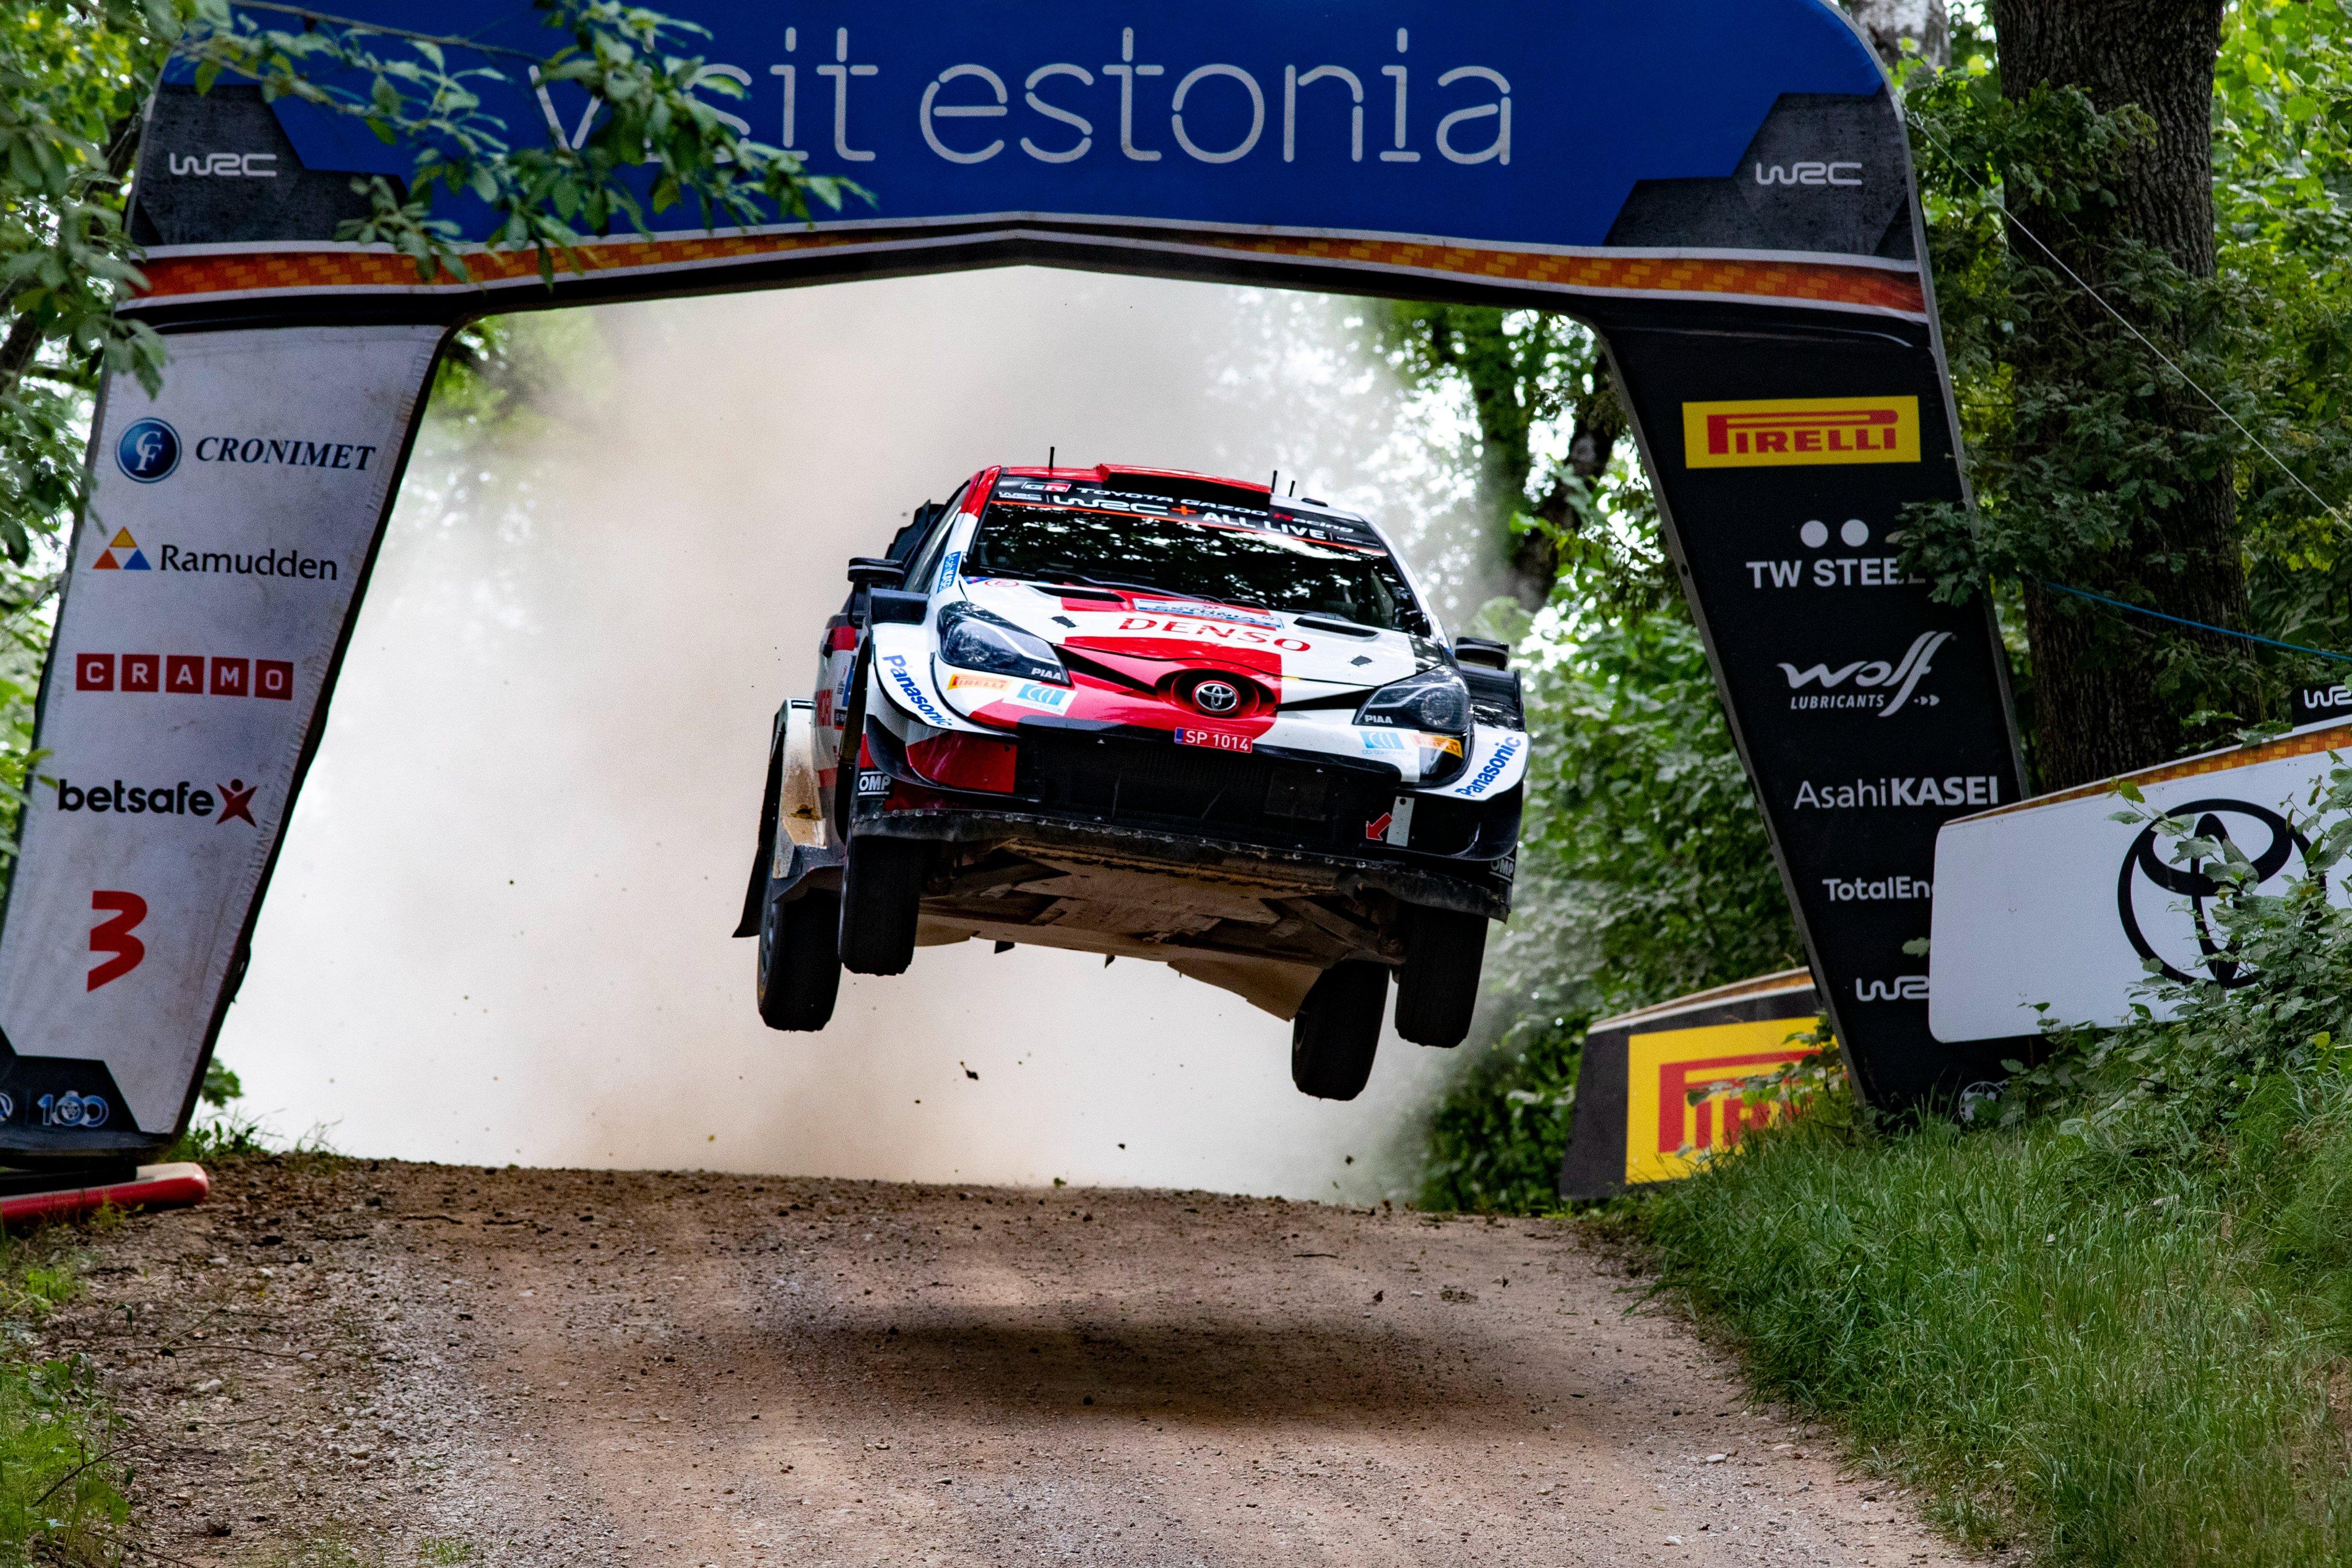 WRC: 11º Rally Estonia [15-18 Julio] - Página 3 E6ec-3gWQAMi3k6?format=jpg&name=4096x4096